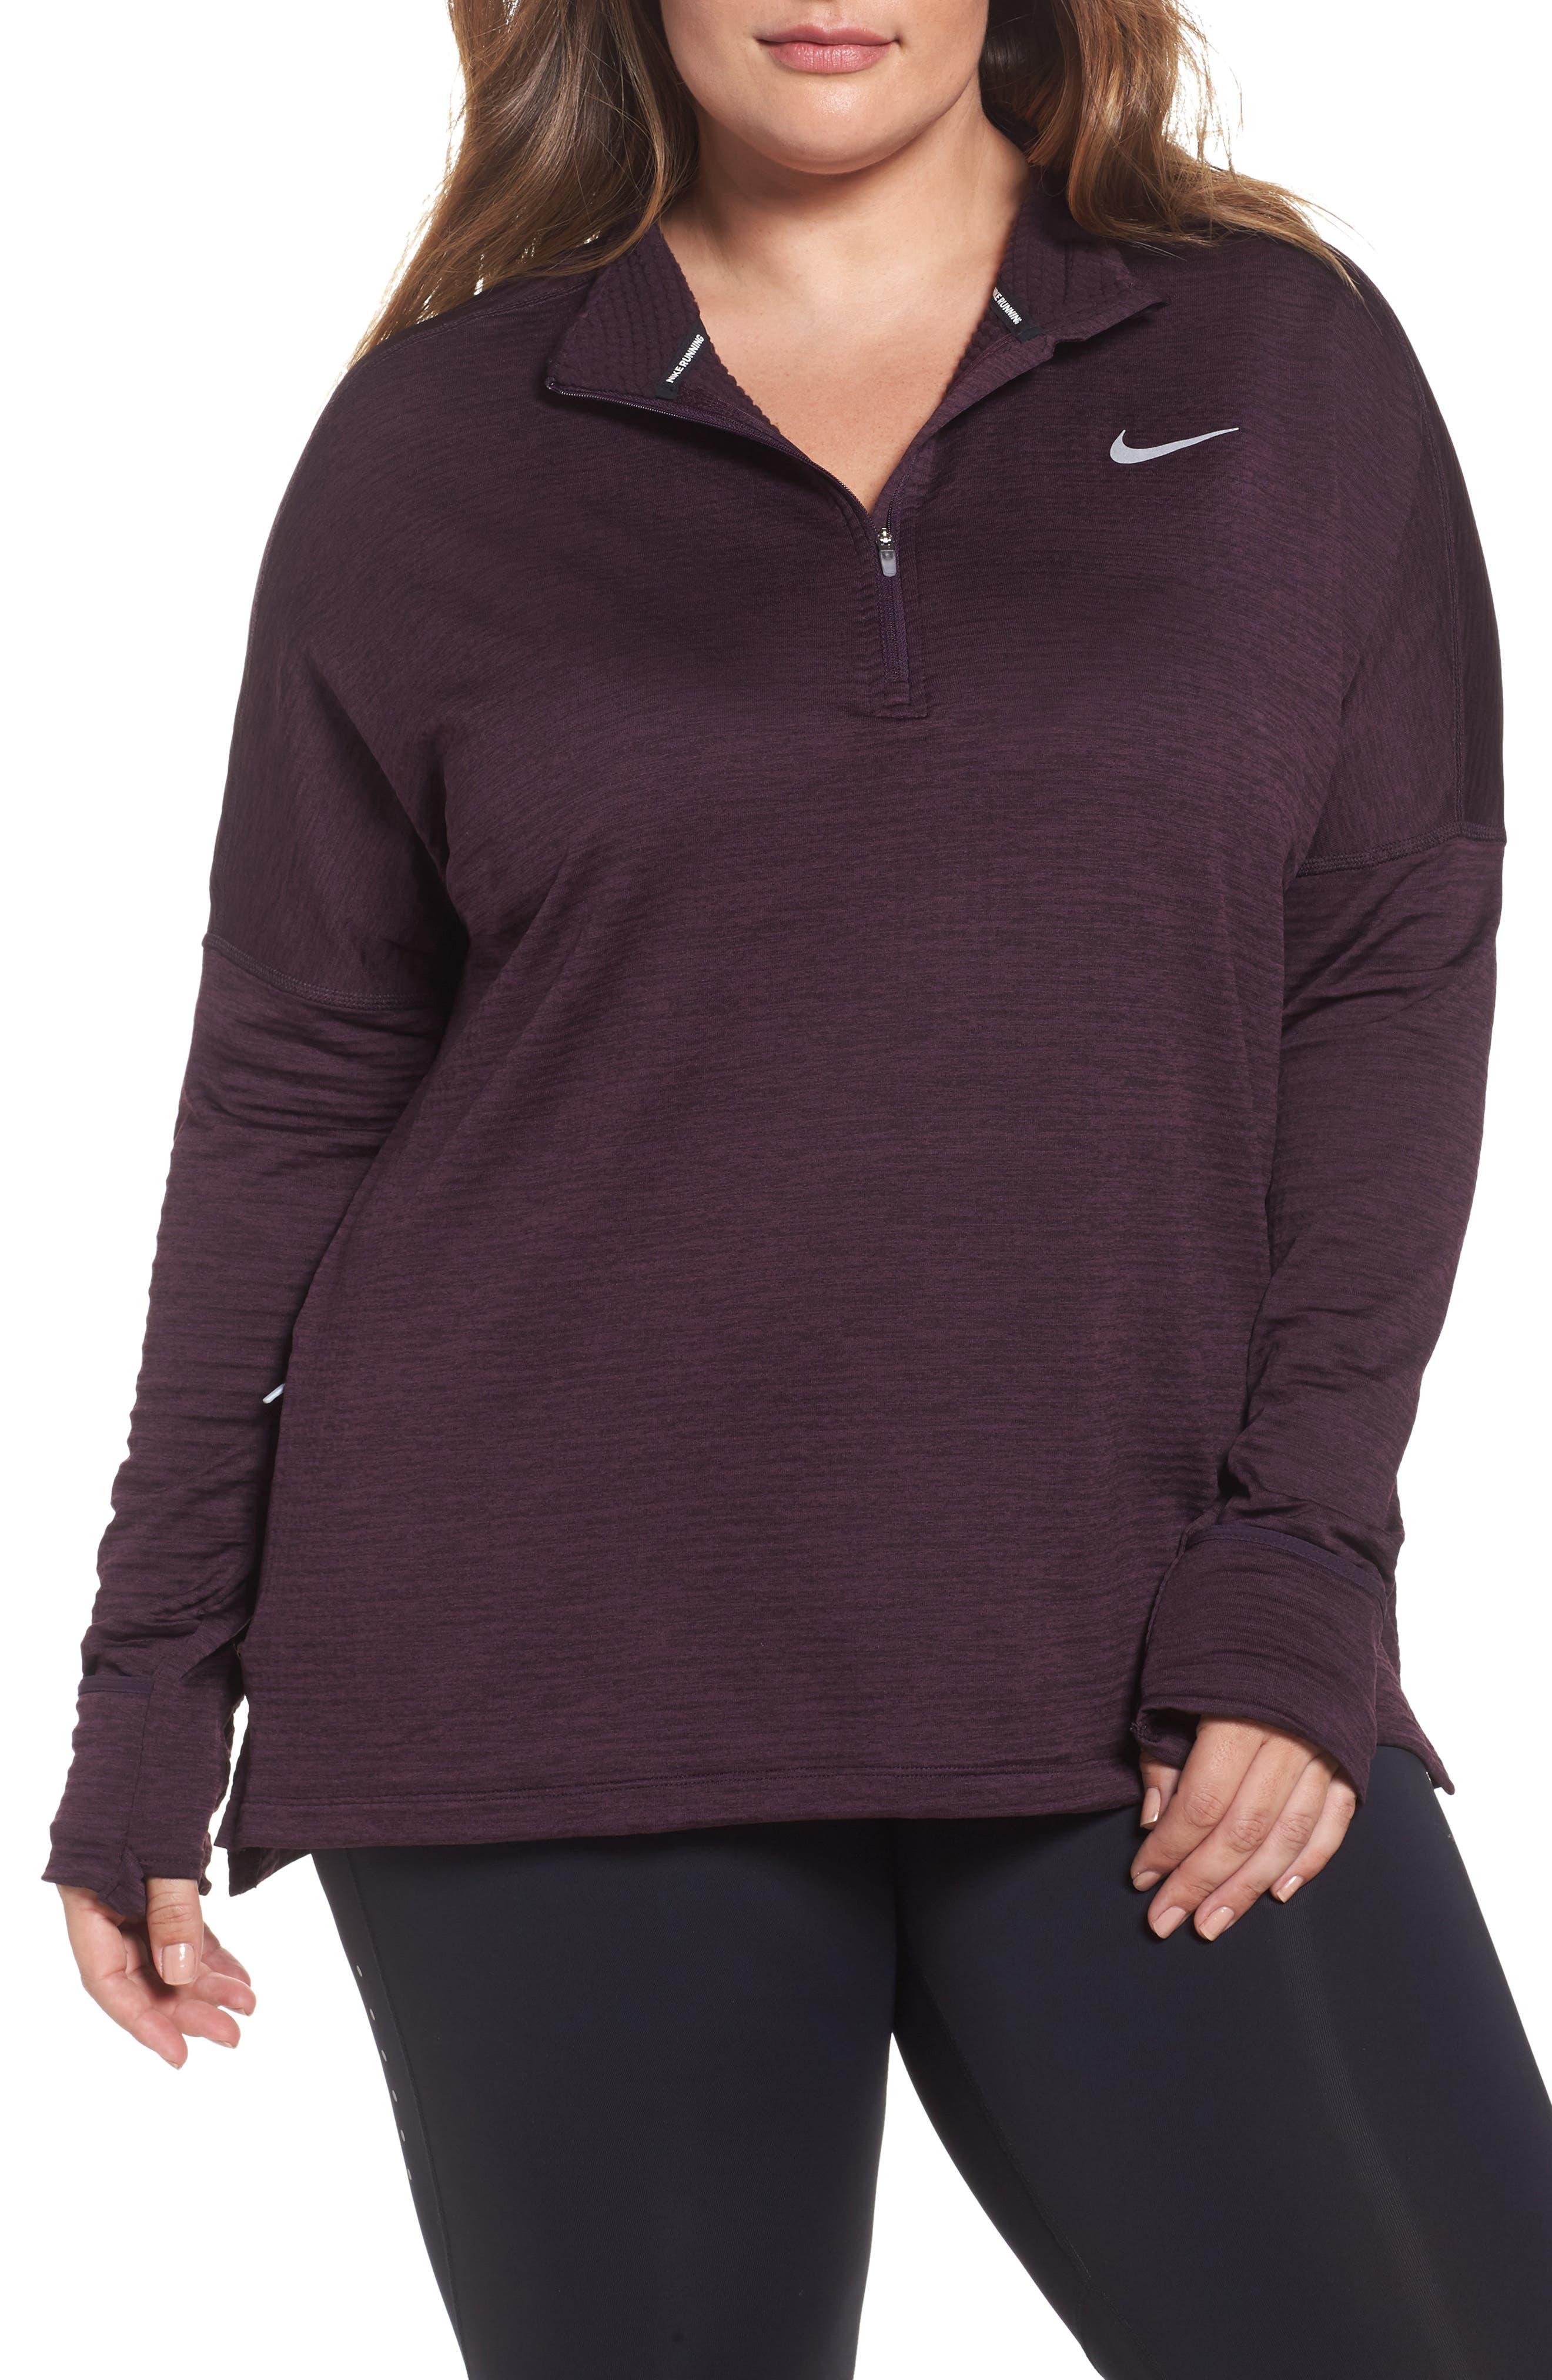 Alternate Image 1 Selected - Nike Sphere Element Long Sleeve Running Top (Plus Size)